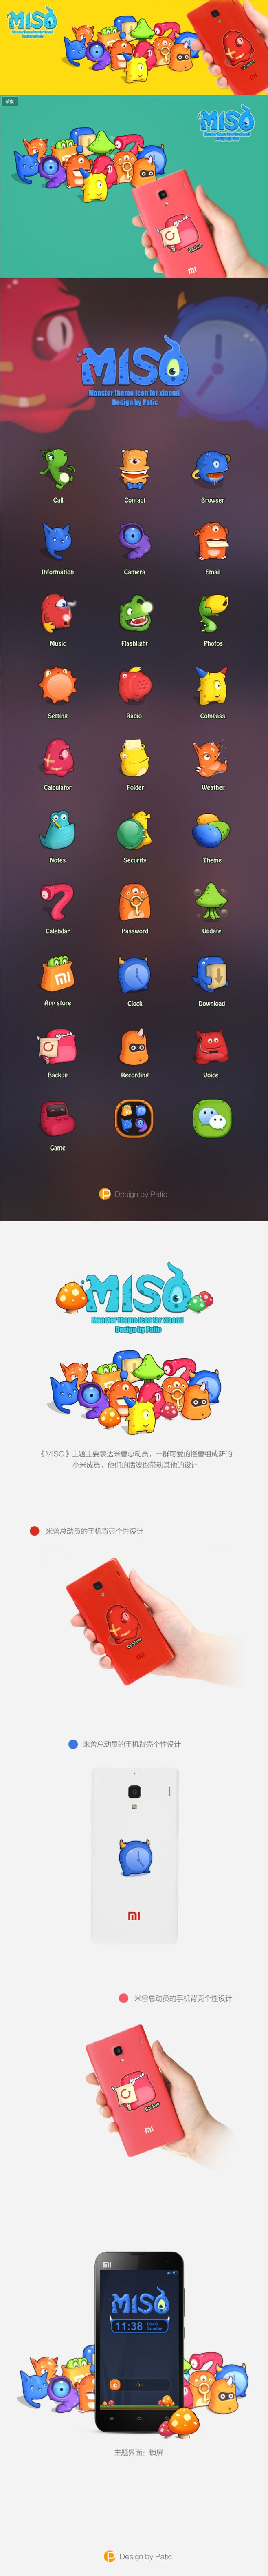 《MISO》or《米兽》-UI中国-专业...